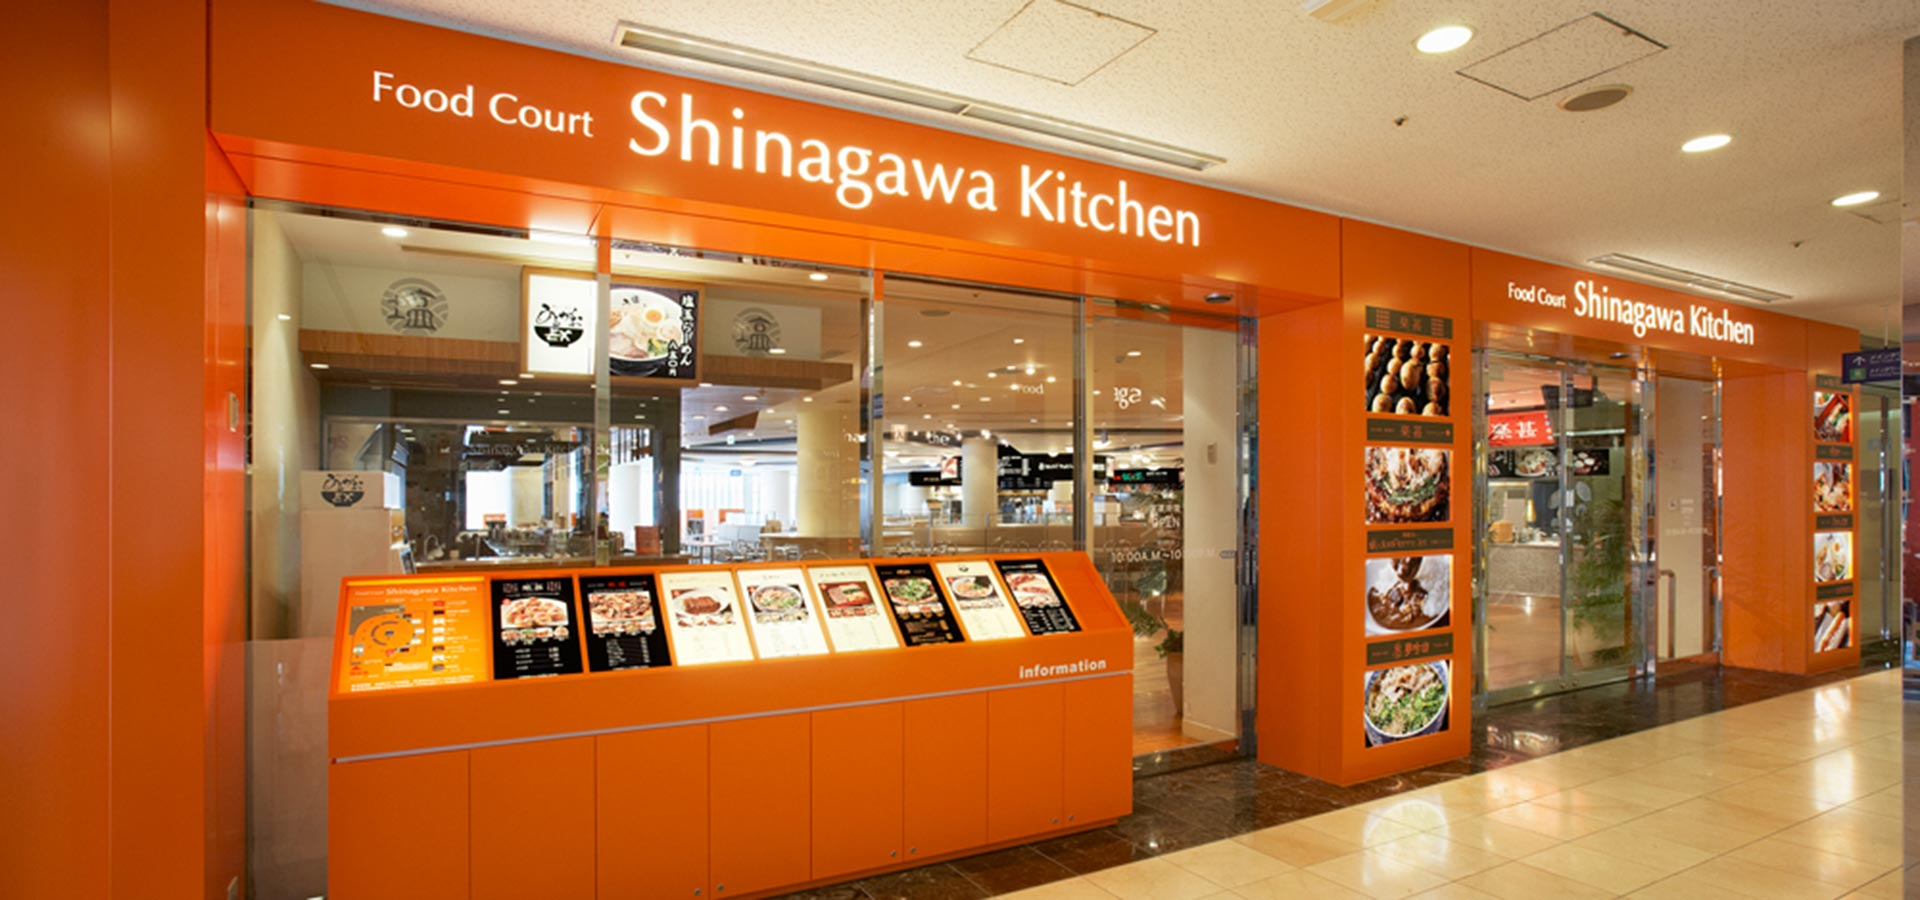 Food Court Shinagawa Kitchen